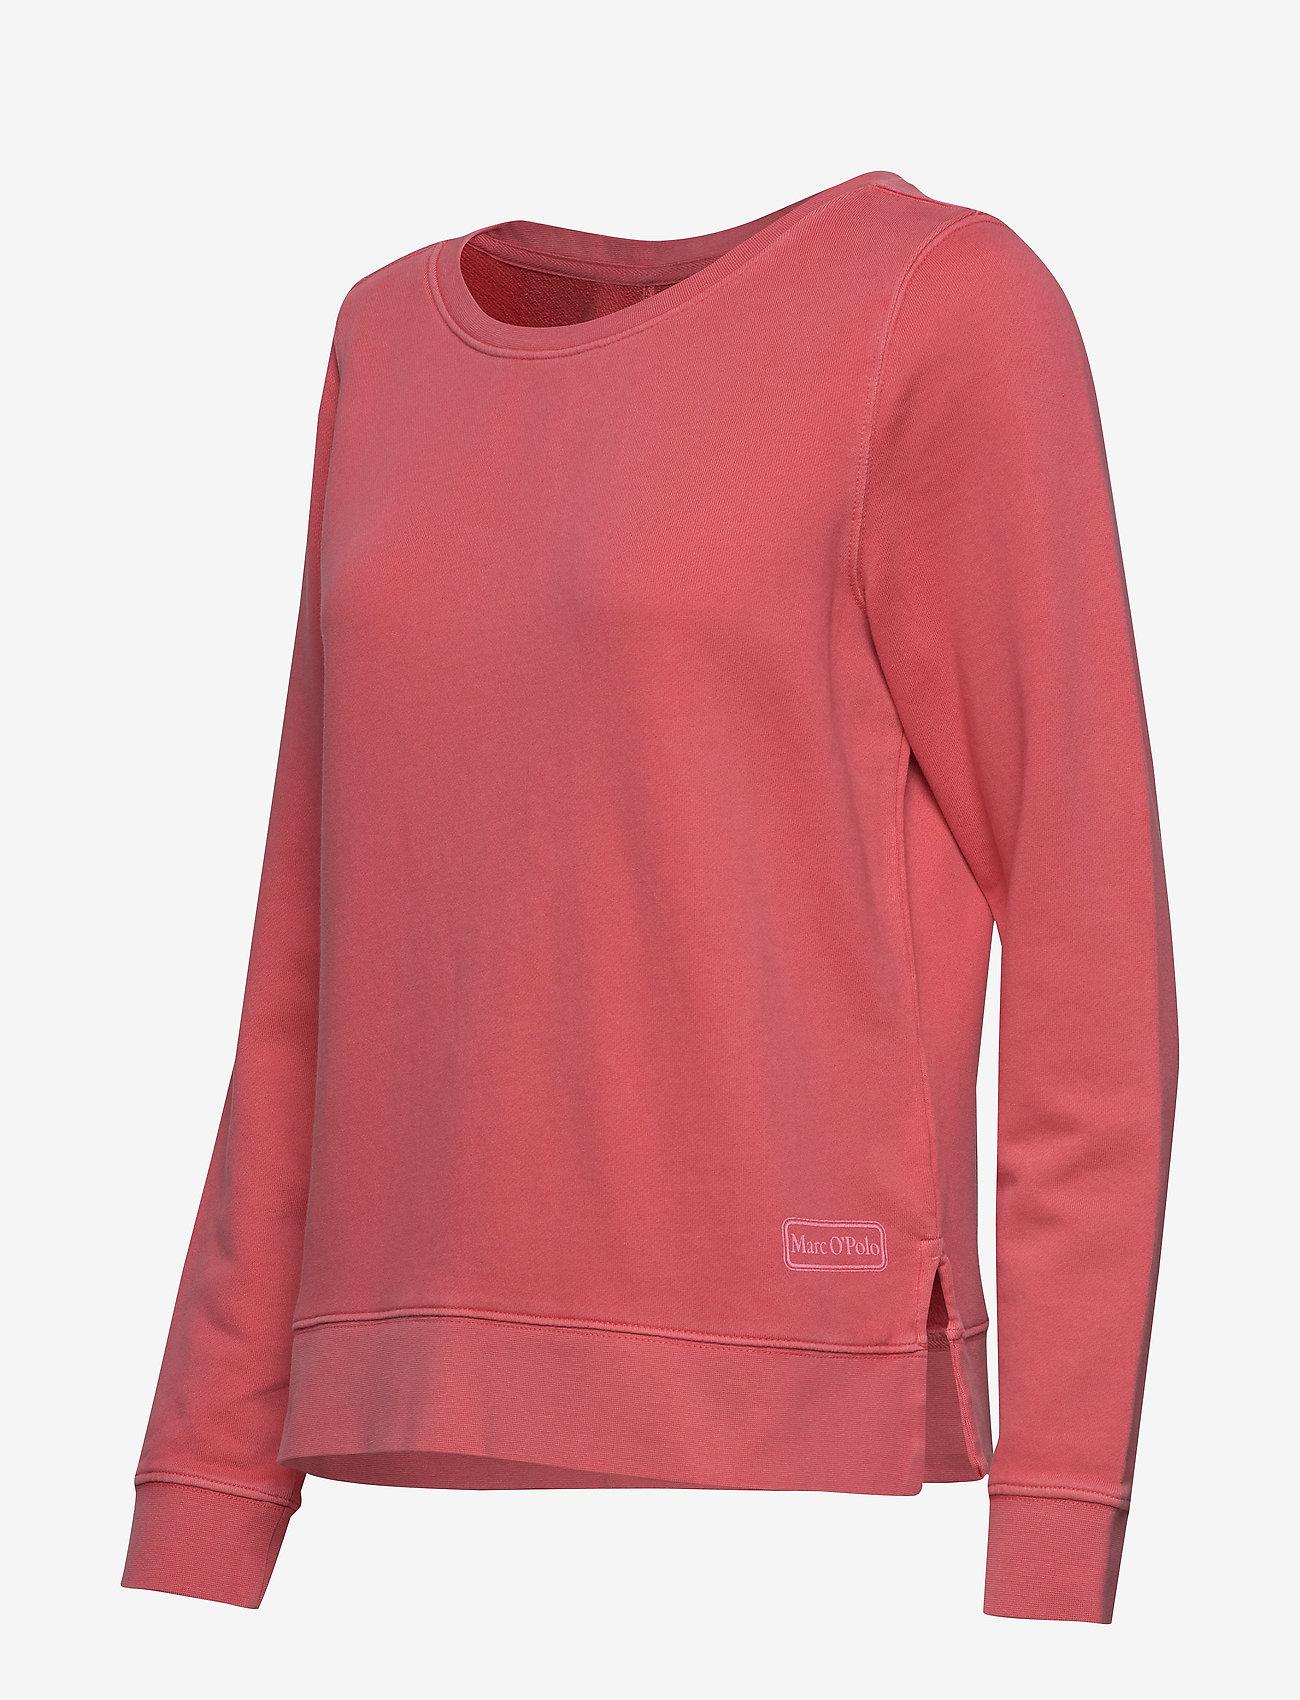 Sweat-shirt, Gmt Dye, Mop Print At (Bright Berry) (714.35 kr) - Marc O'Polo